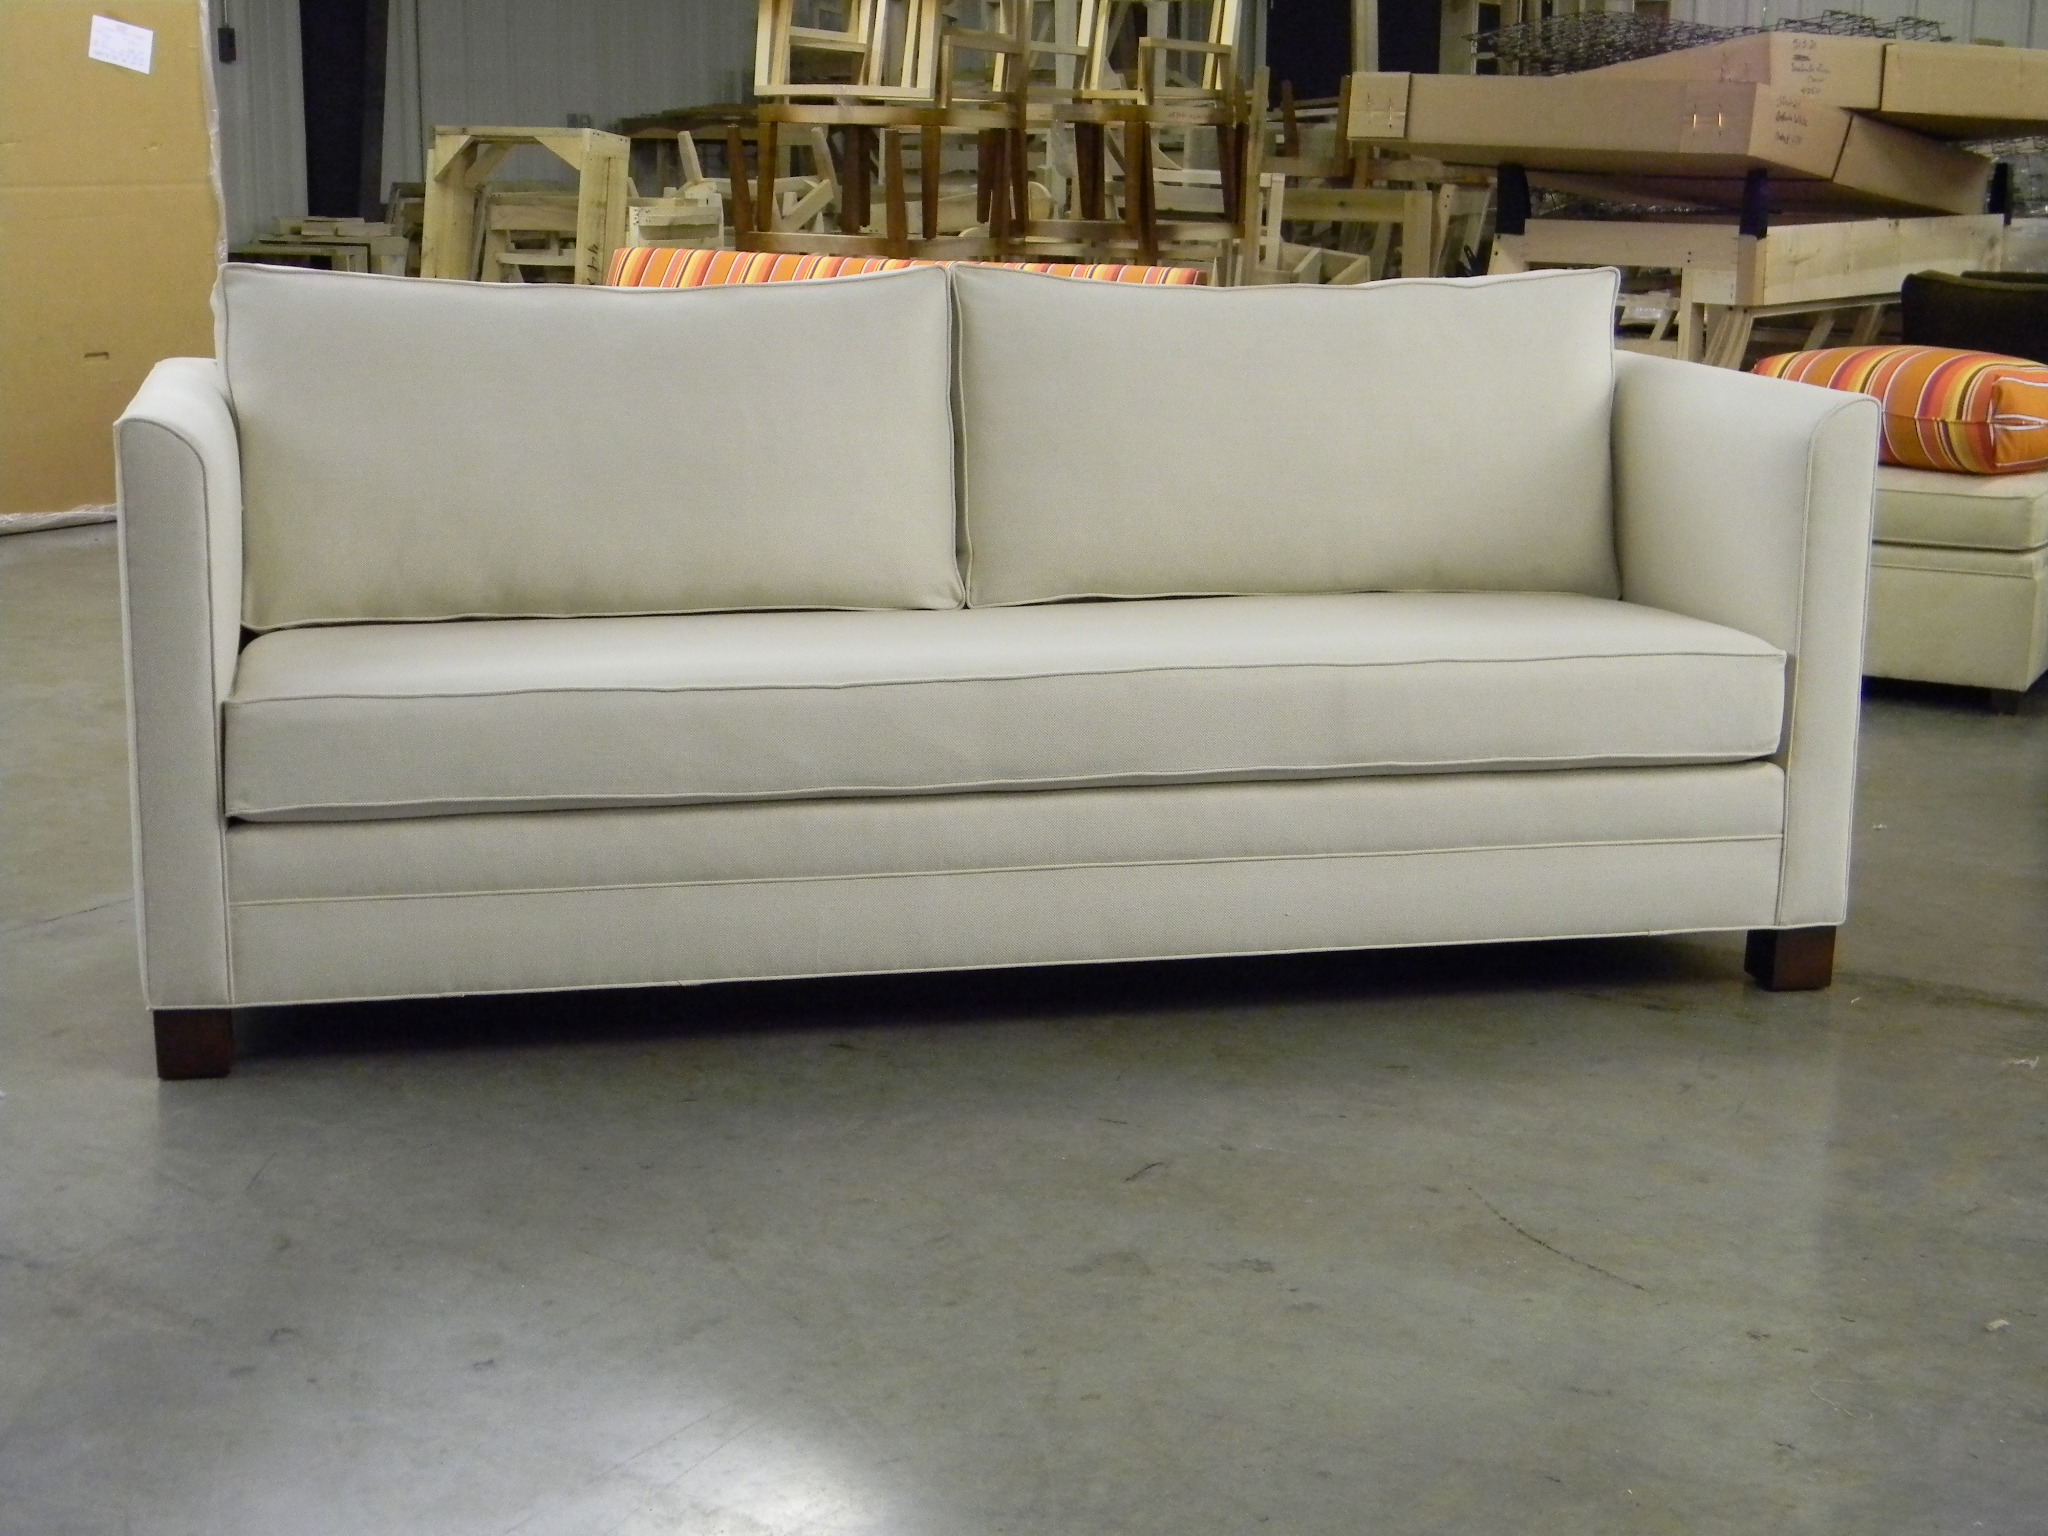 Carolina Chair Testimonials Reviews Hy Customers 2017 Custom Furniture Sectional Sofas